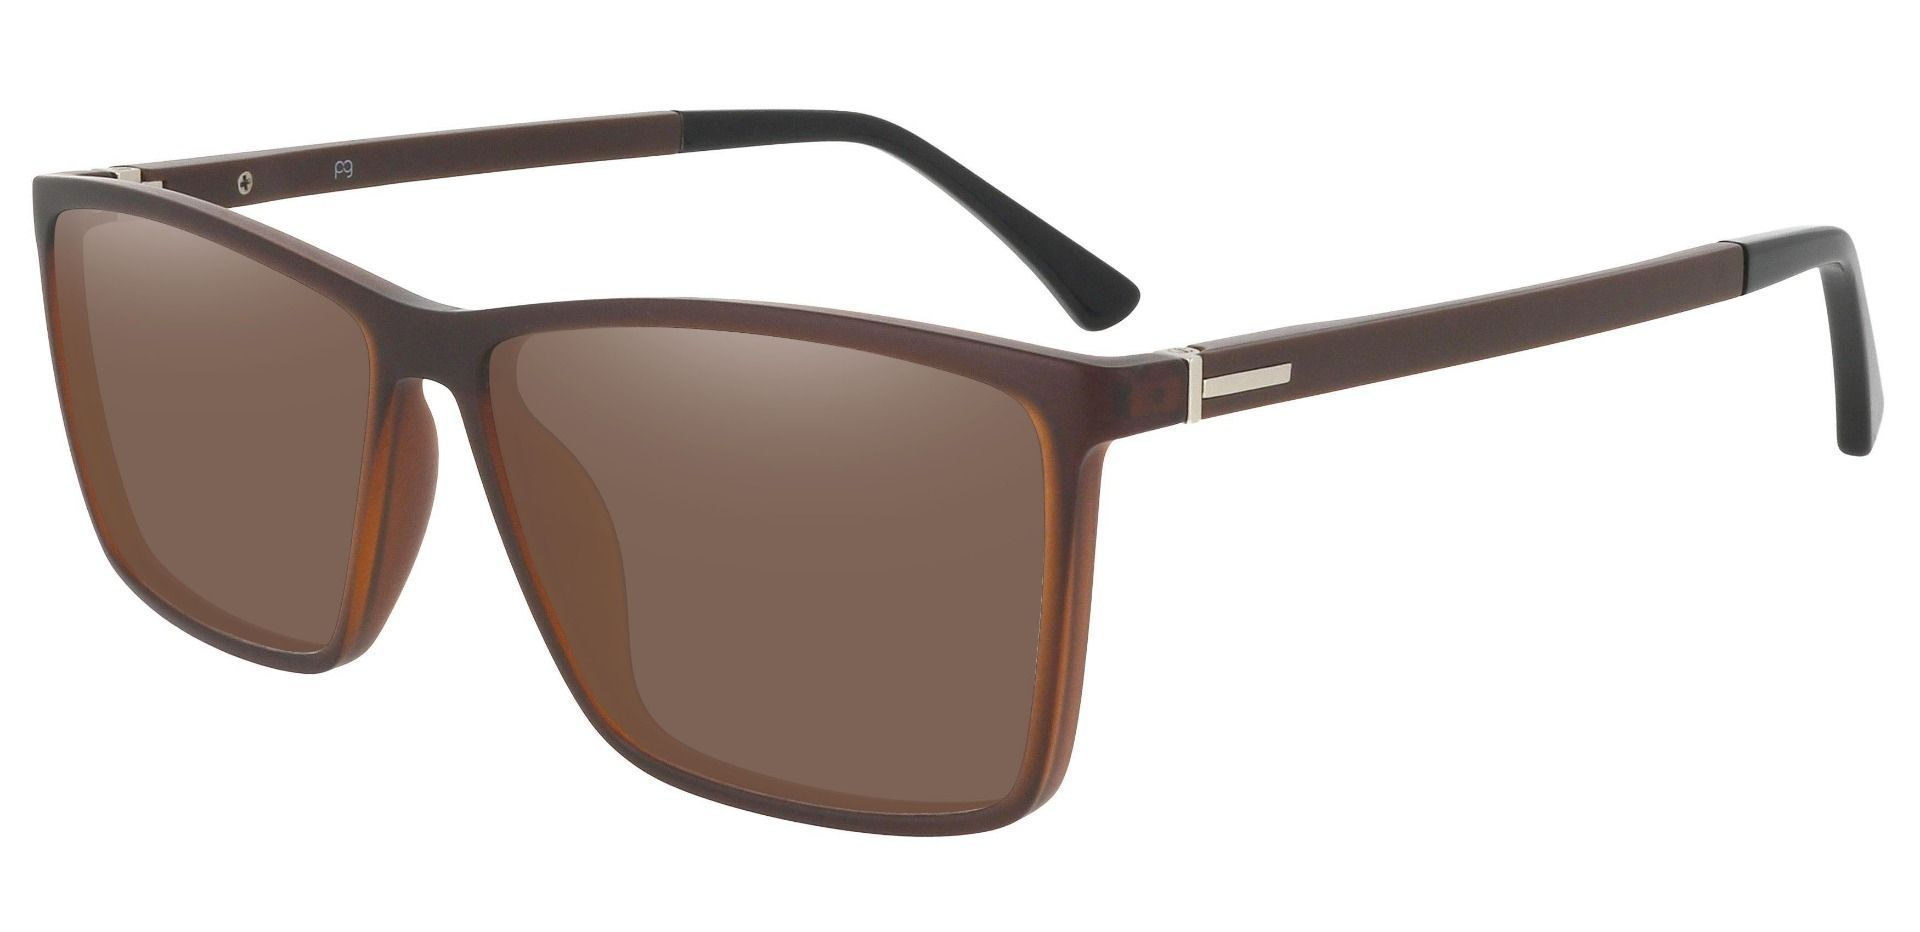 Louie Square Prescription Sunglasses - Brown Frame With Brown Lenses